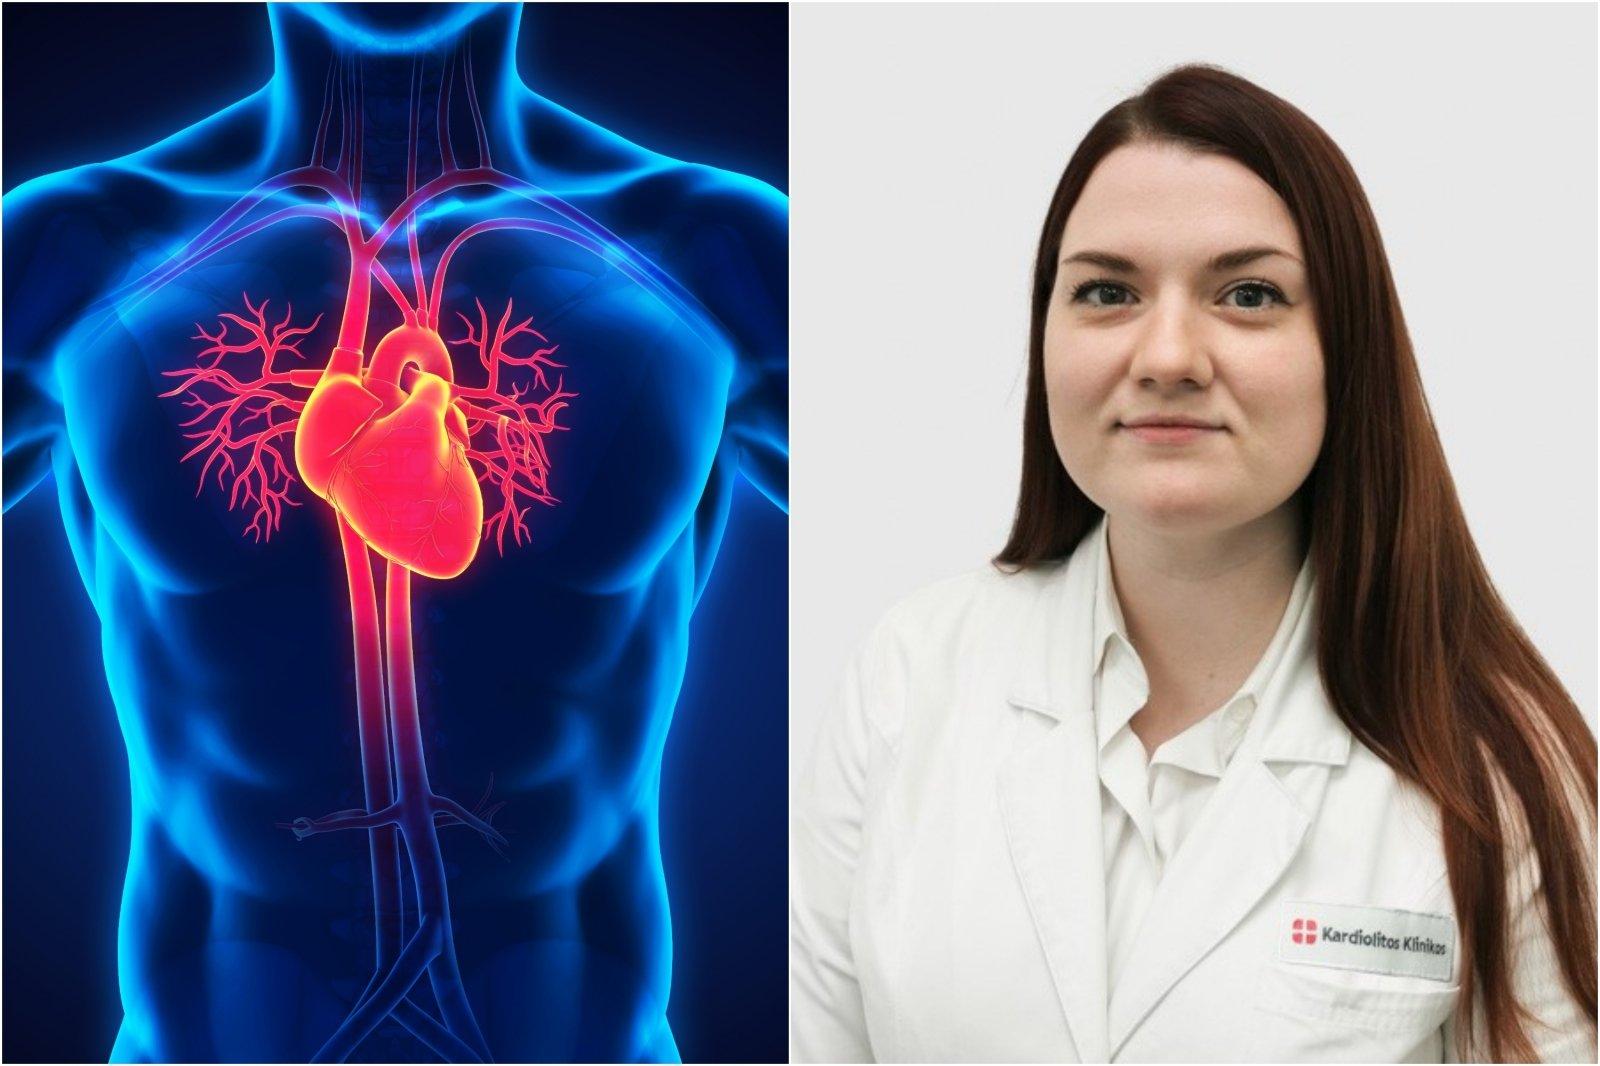 svoris ir širdies sveikata hipertenzija smegenų kraujavimas